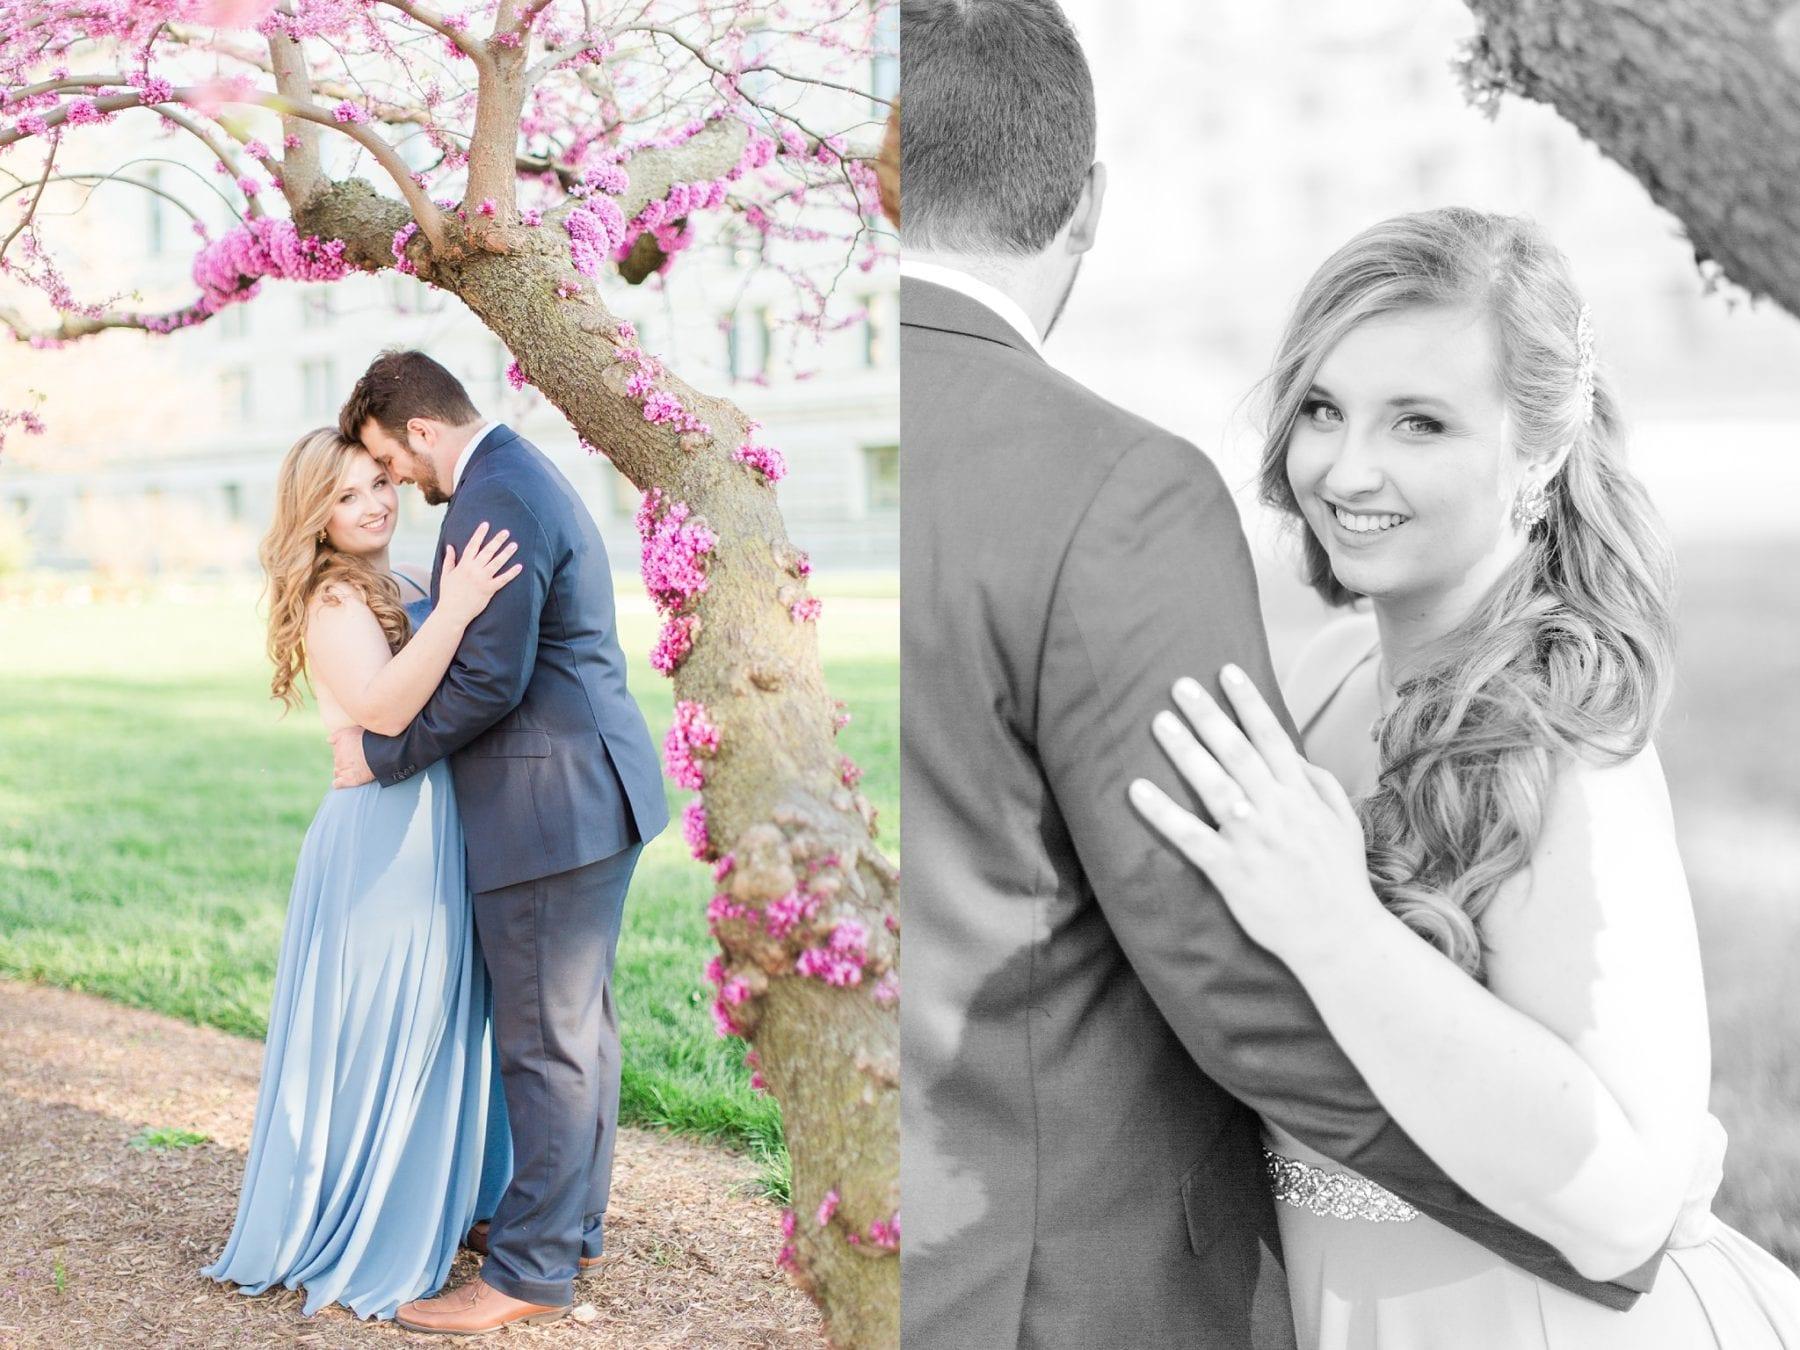 Capitol Hill Engagement Photos Kelly & Zach Washington DC Wedding Photographer Megan Kelsey Photography-84.jpg